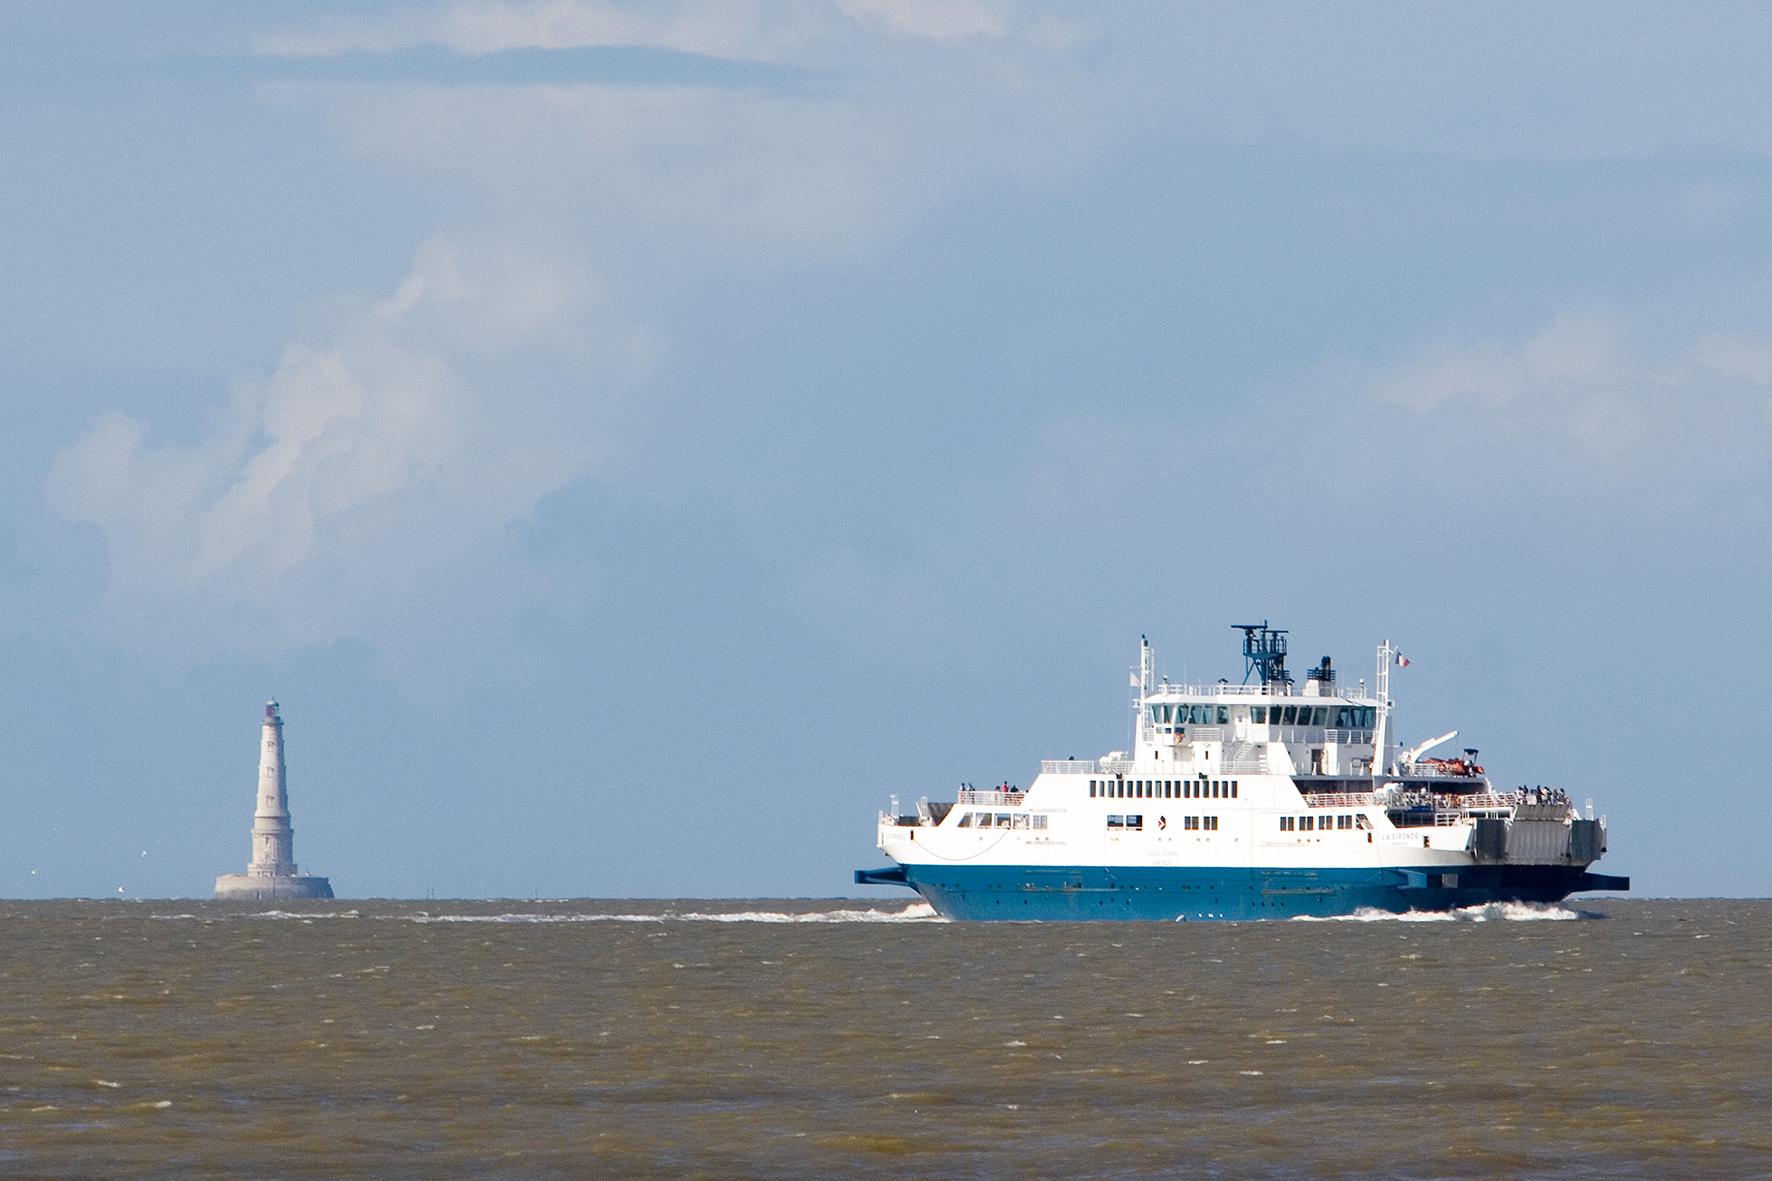 Les Bacs Girondins Ferries Gironde Fr